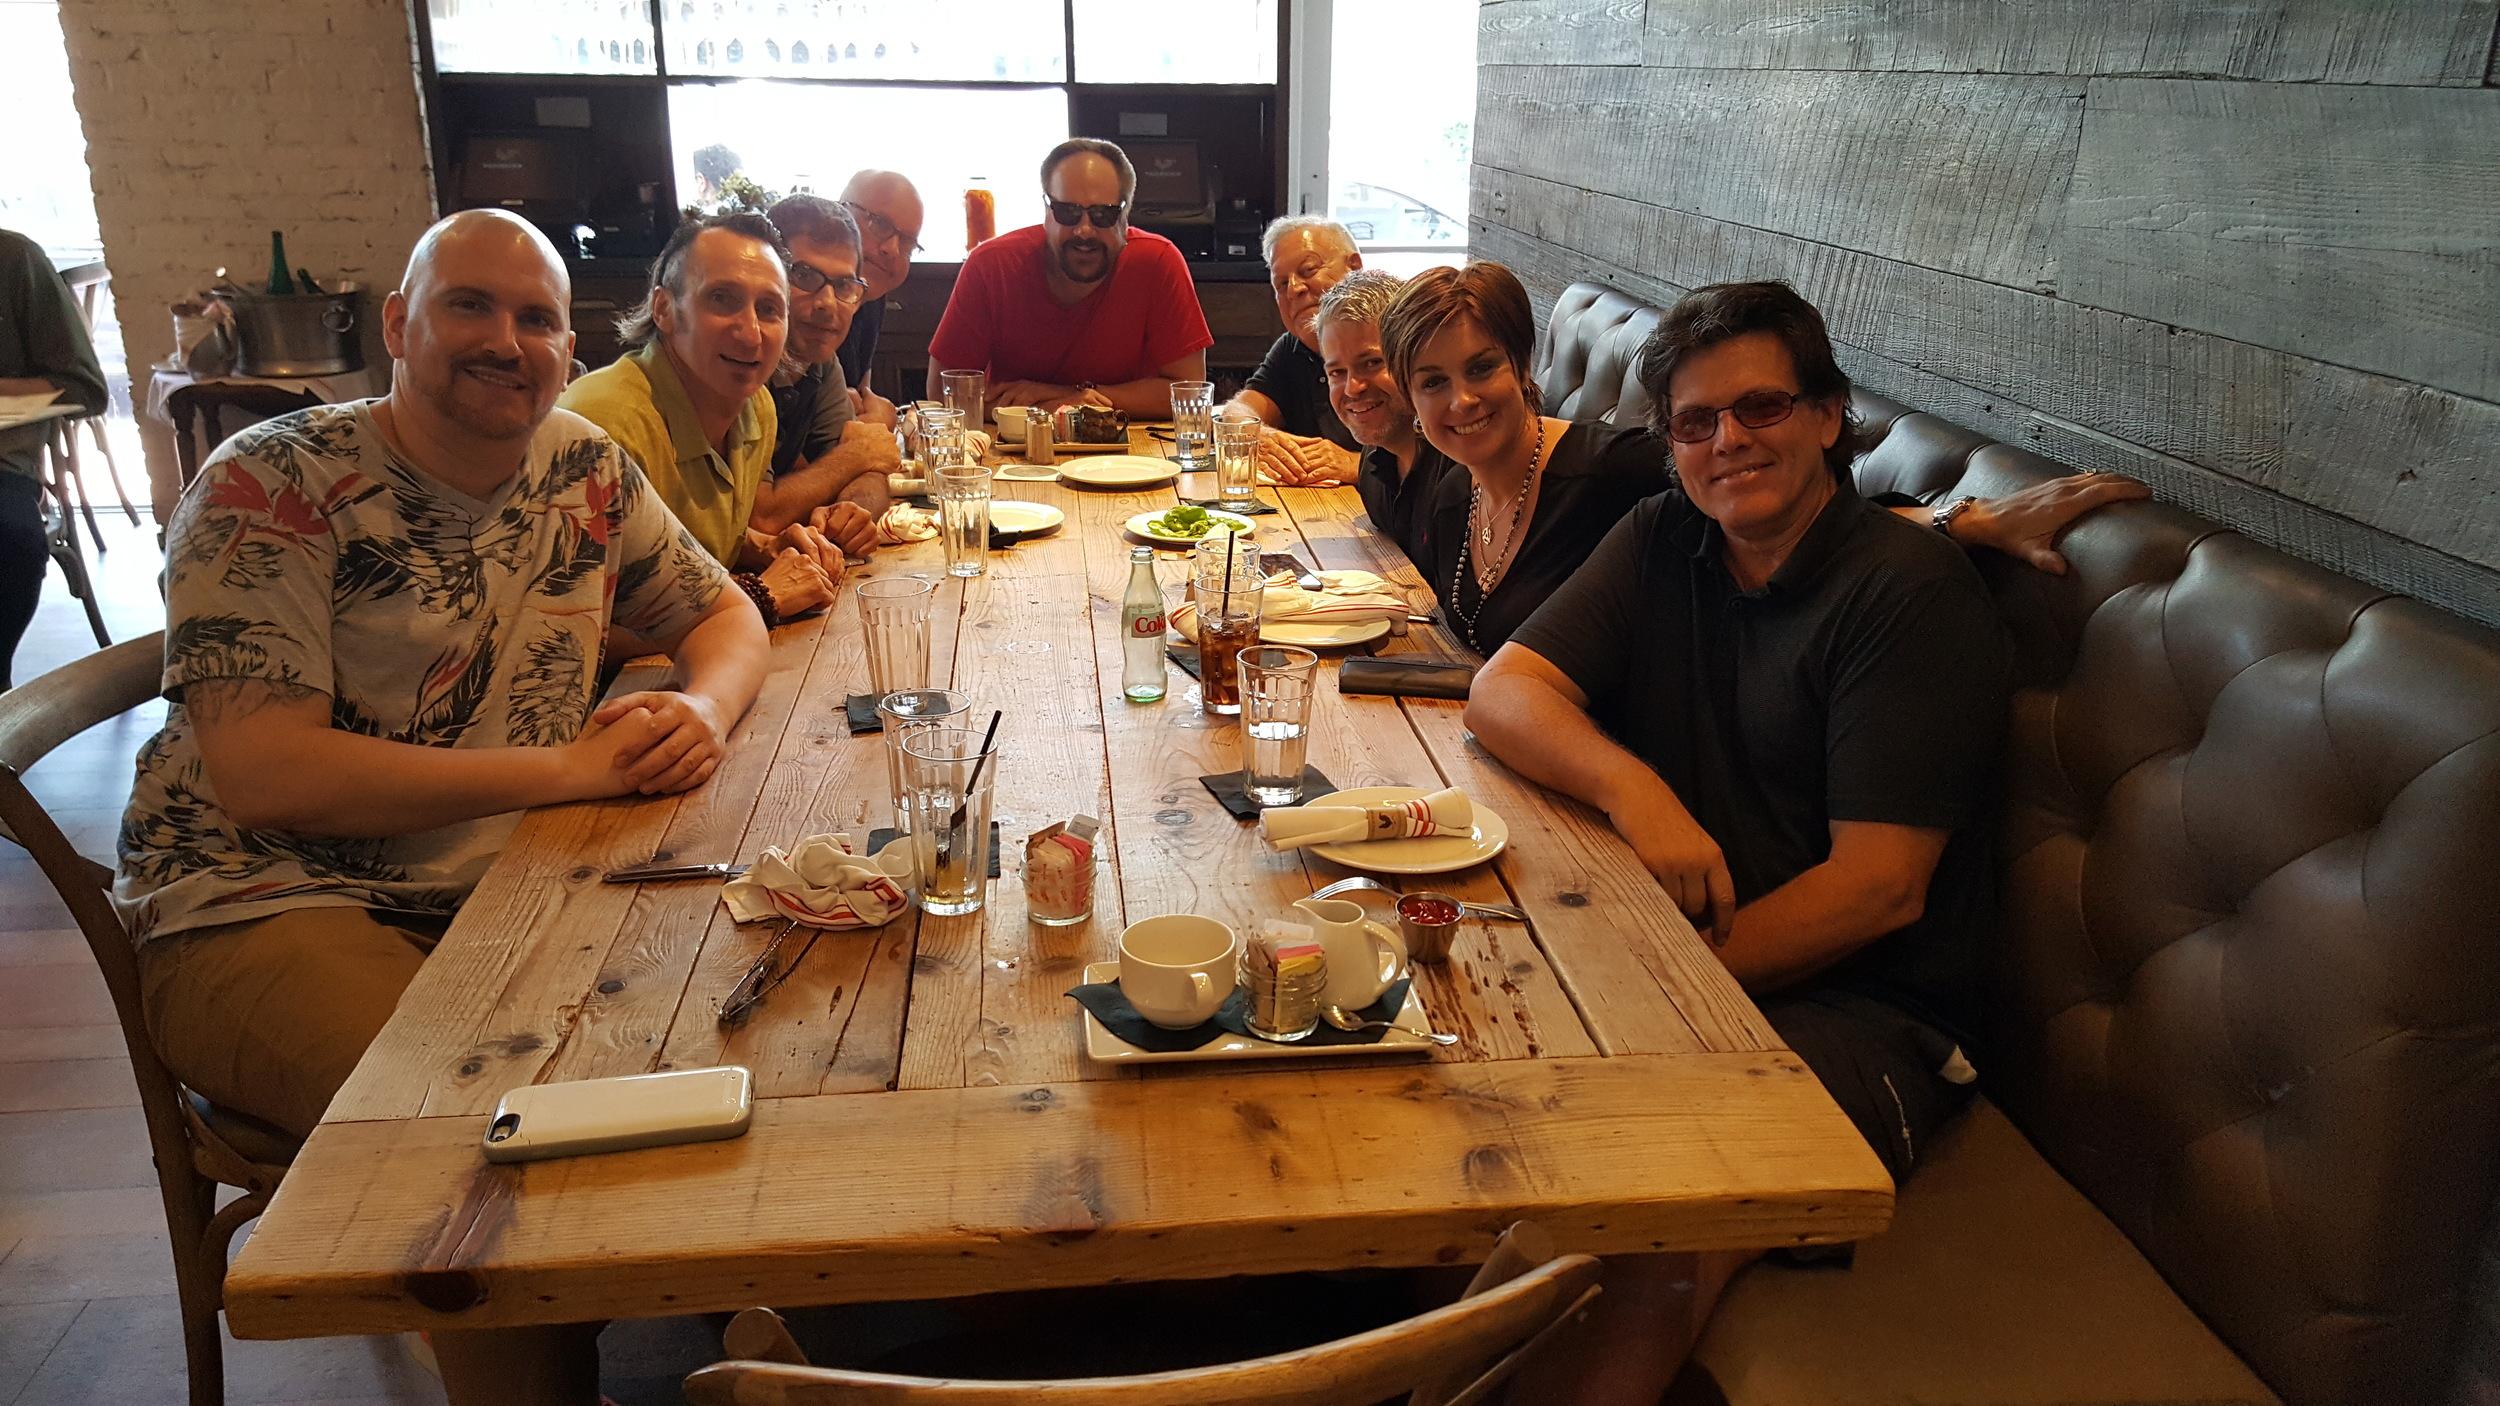 Left to Right : Cire Citron, Brad LeBeau, Andrew Friend, Craig Snider, K.C., Bobby Stoner, Paul Elaloof, Tracy Young, Gary Rottger